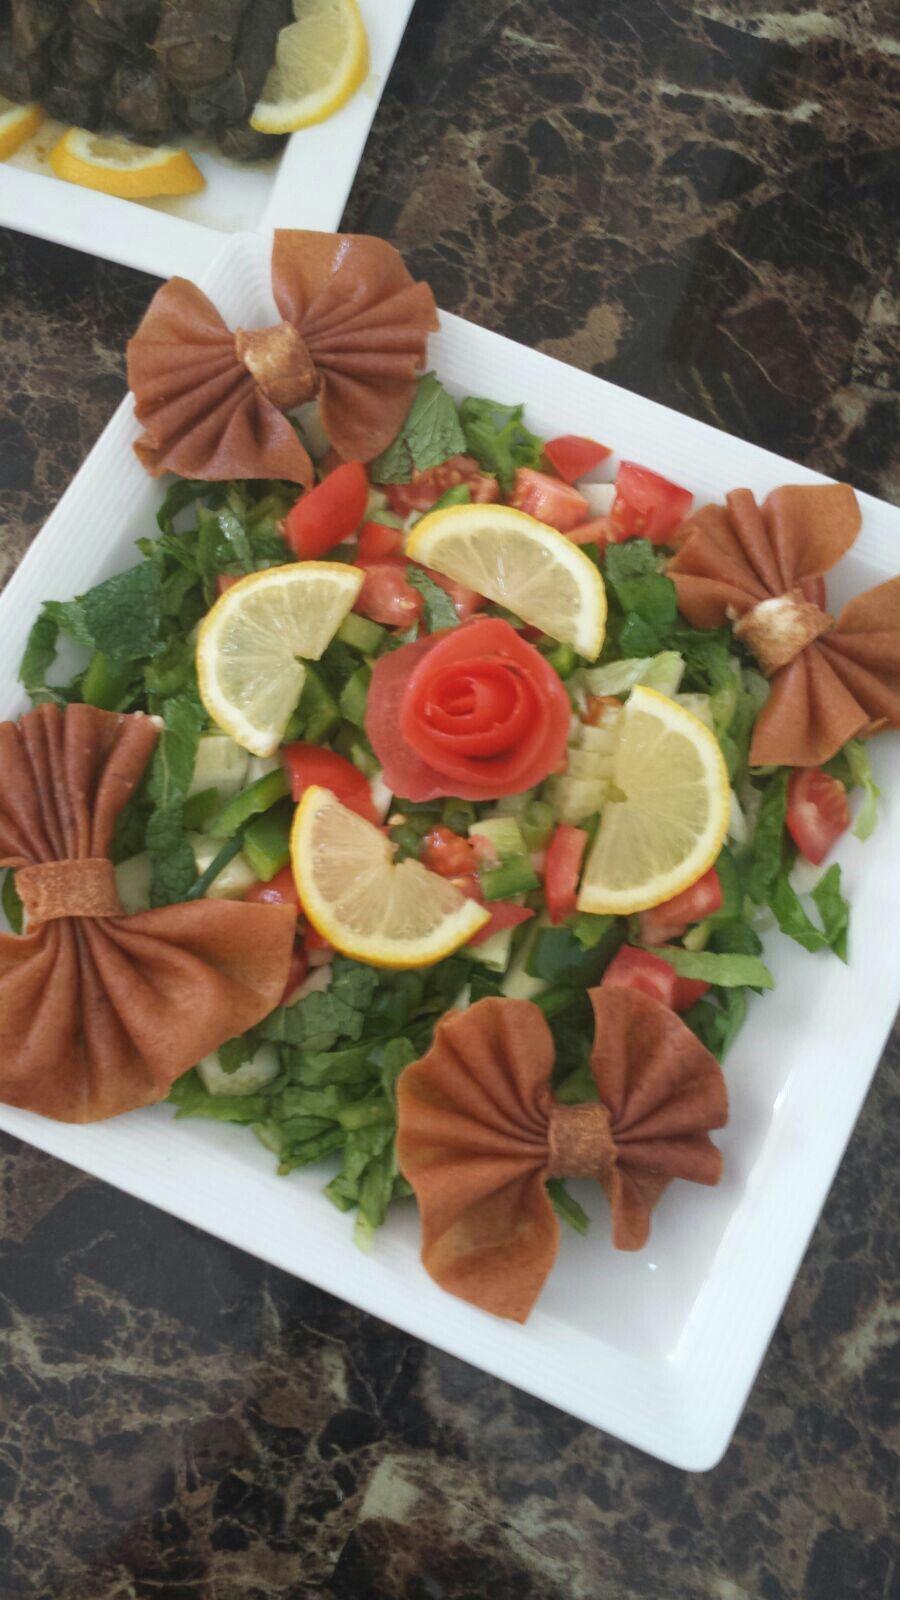 Pin By Bibicha Lamkalcha On اطباق عالم المرأة Party Food Buffet Food Decoration Serving Food